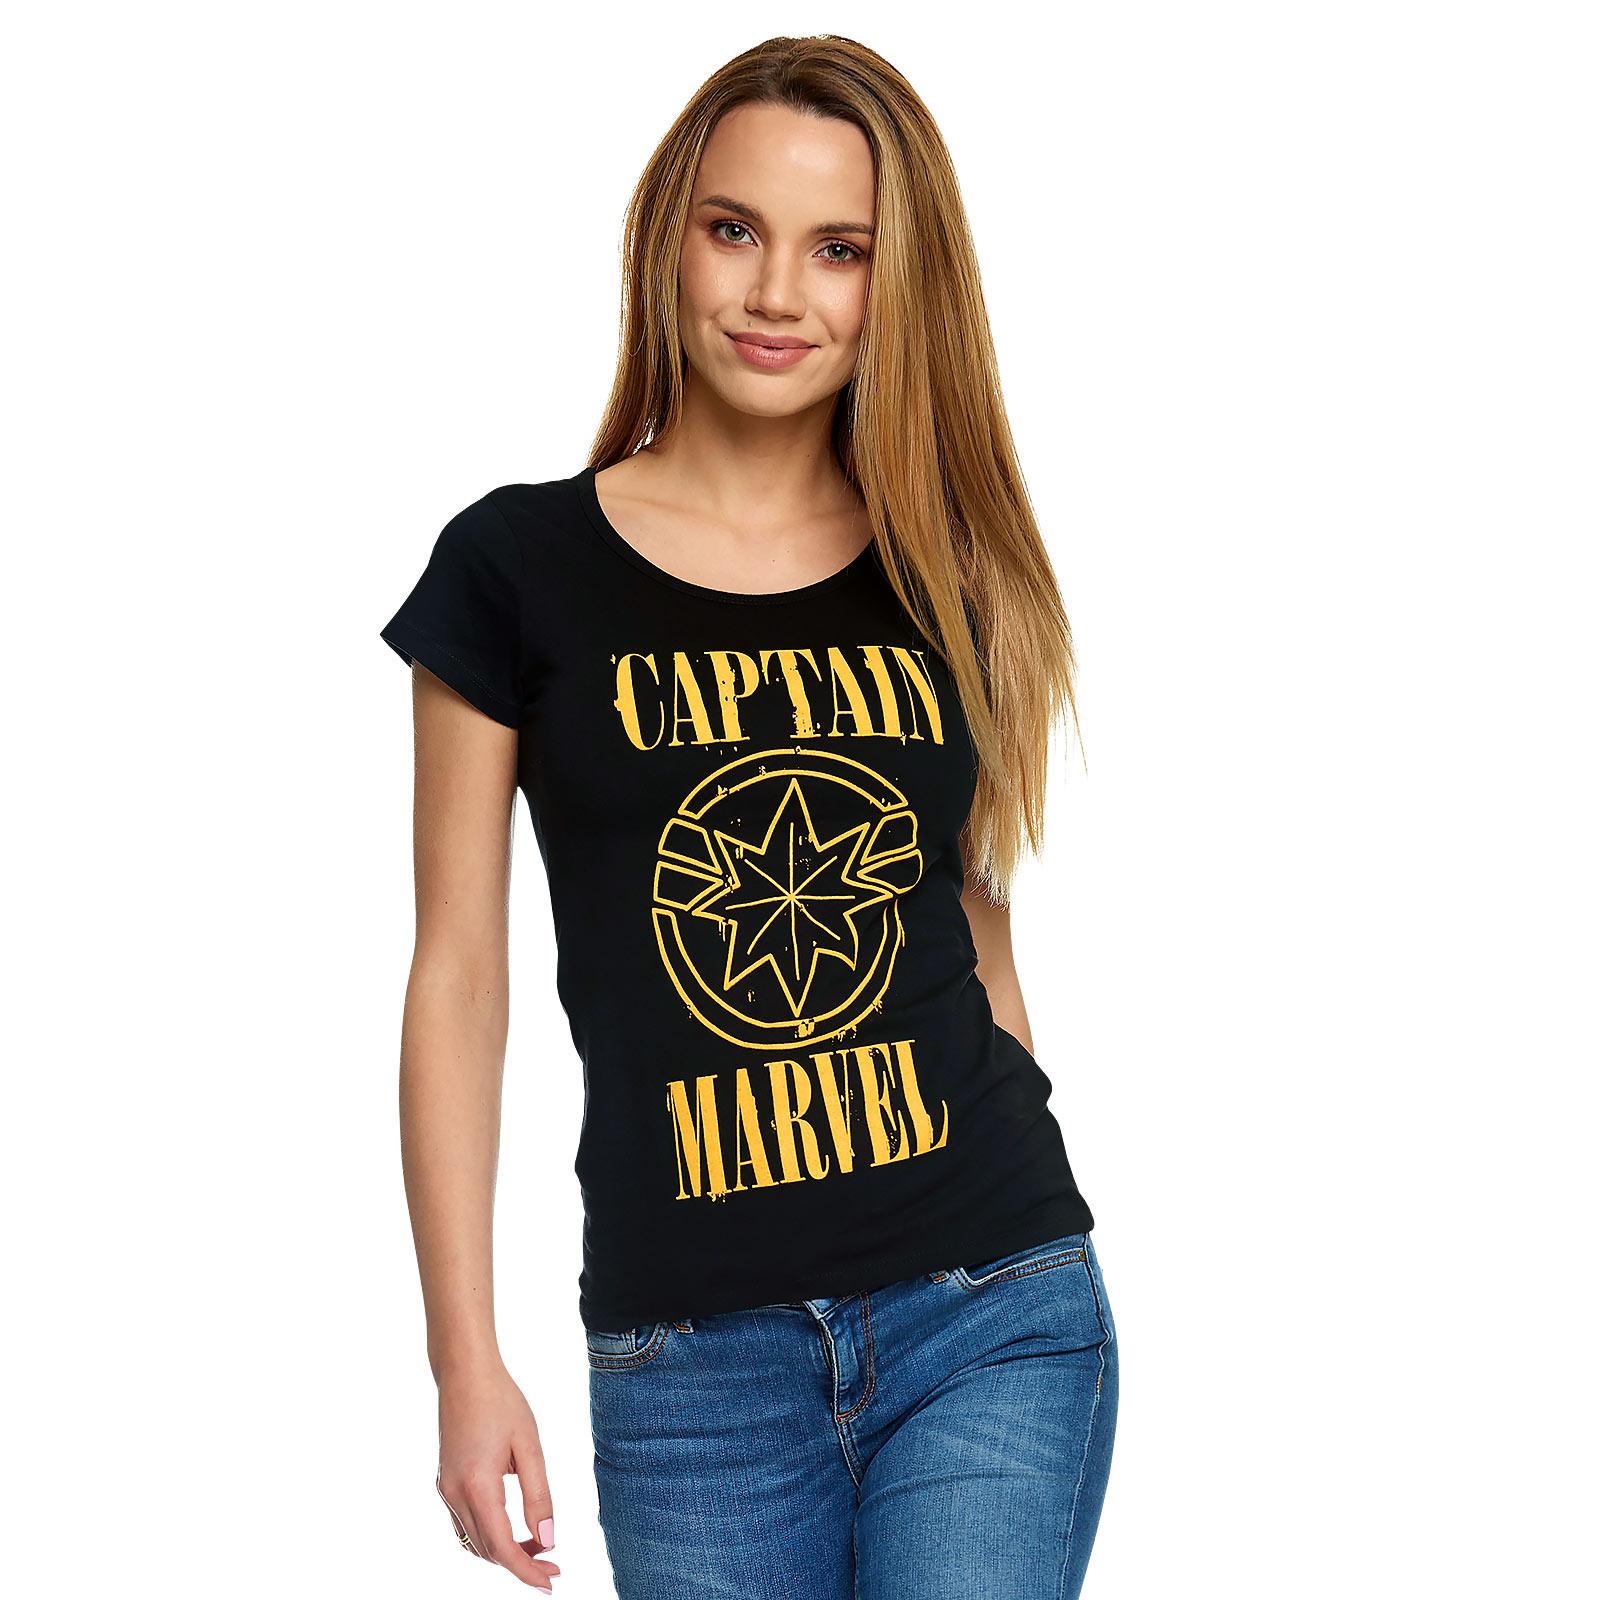 Captain Marvel - Grunge Logo T-Shirt Damen schwarz